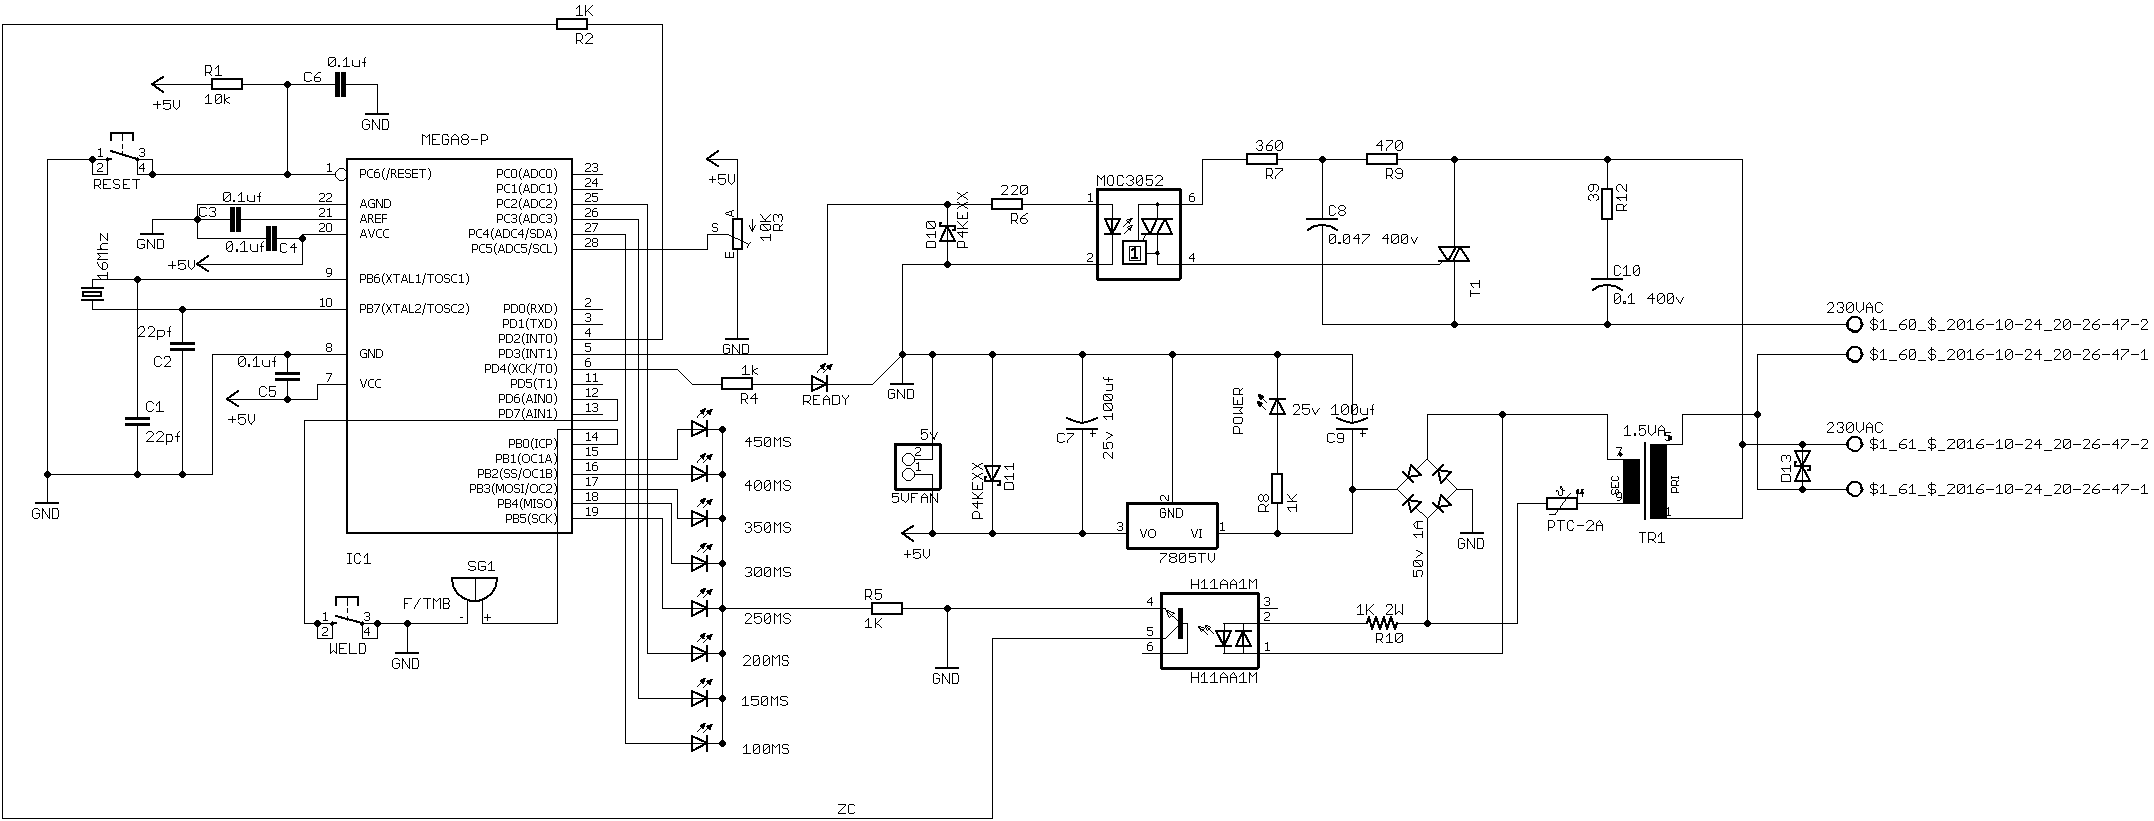 Miller Dynasty Wiring Diagram on miller maxstar 700, miller maxstar 200, miller bobcat 225 nt parts, miller welders dynasty 200,